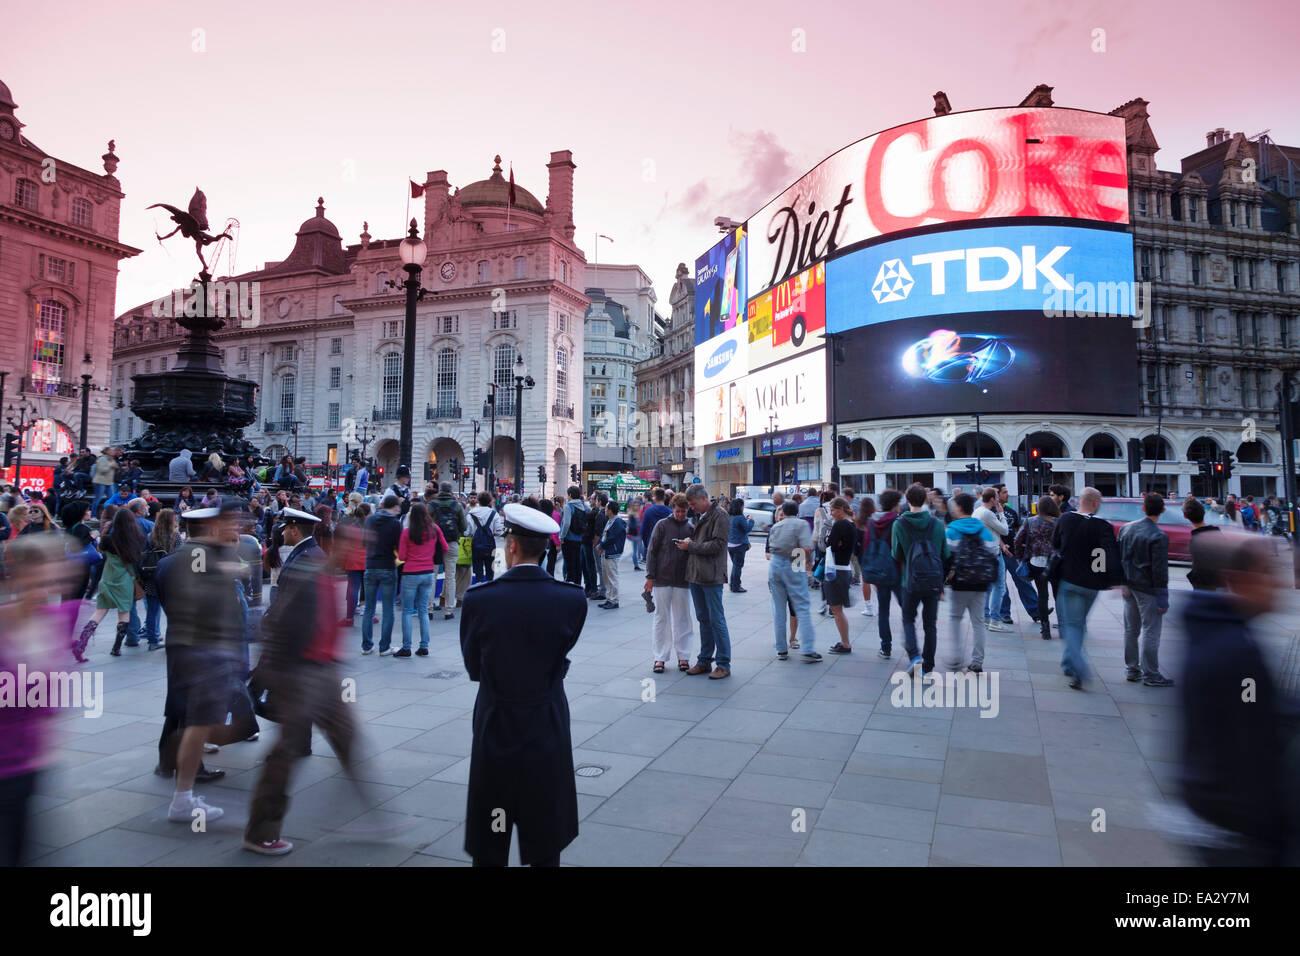 Statue of Eros, Piccadilly Circus, London, England, United Kingdom, Europe - Stock Image